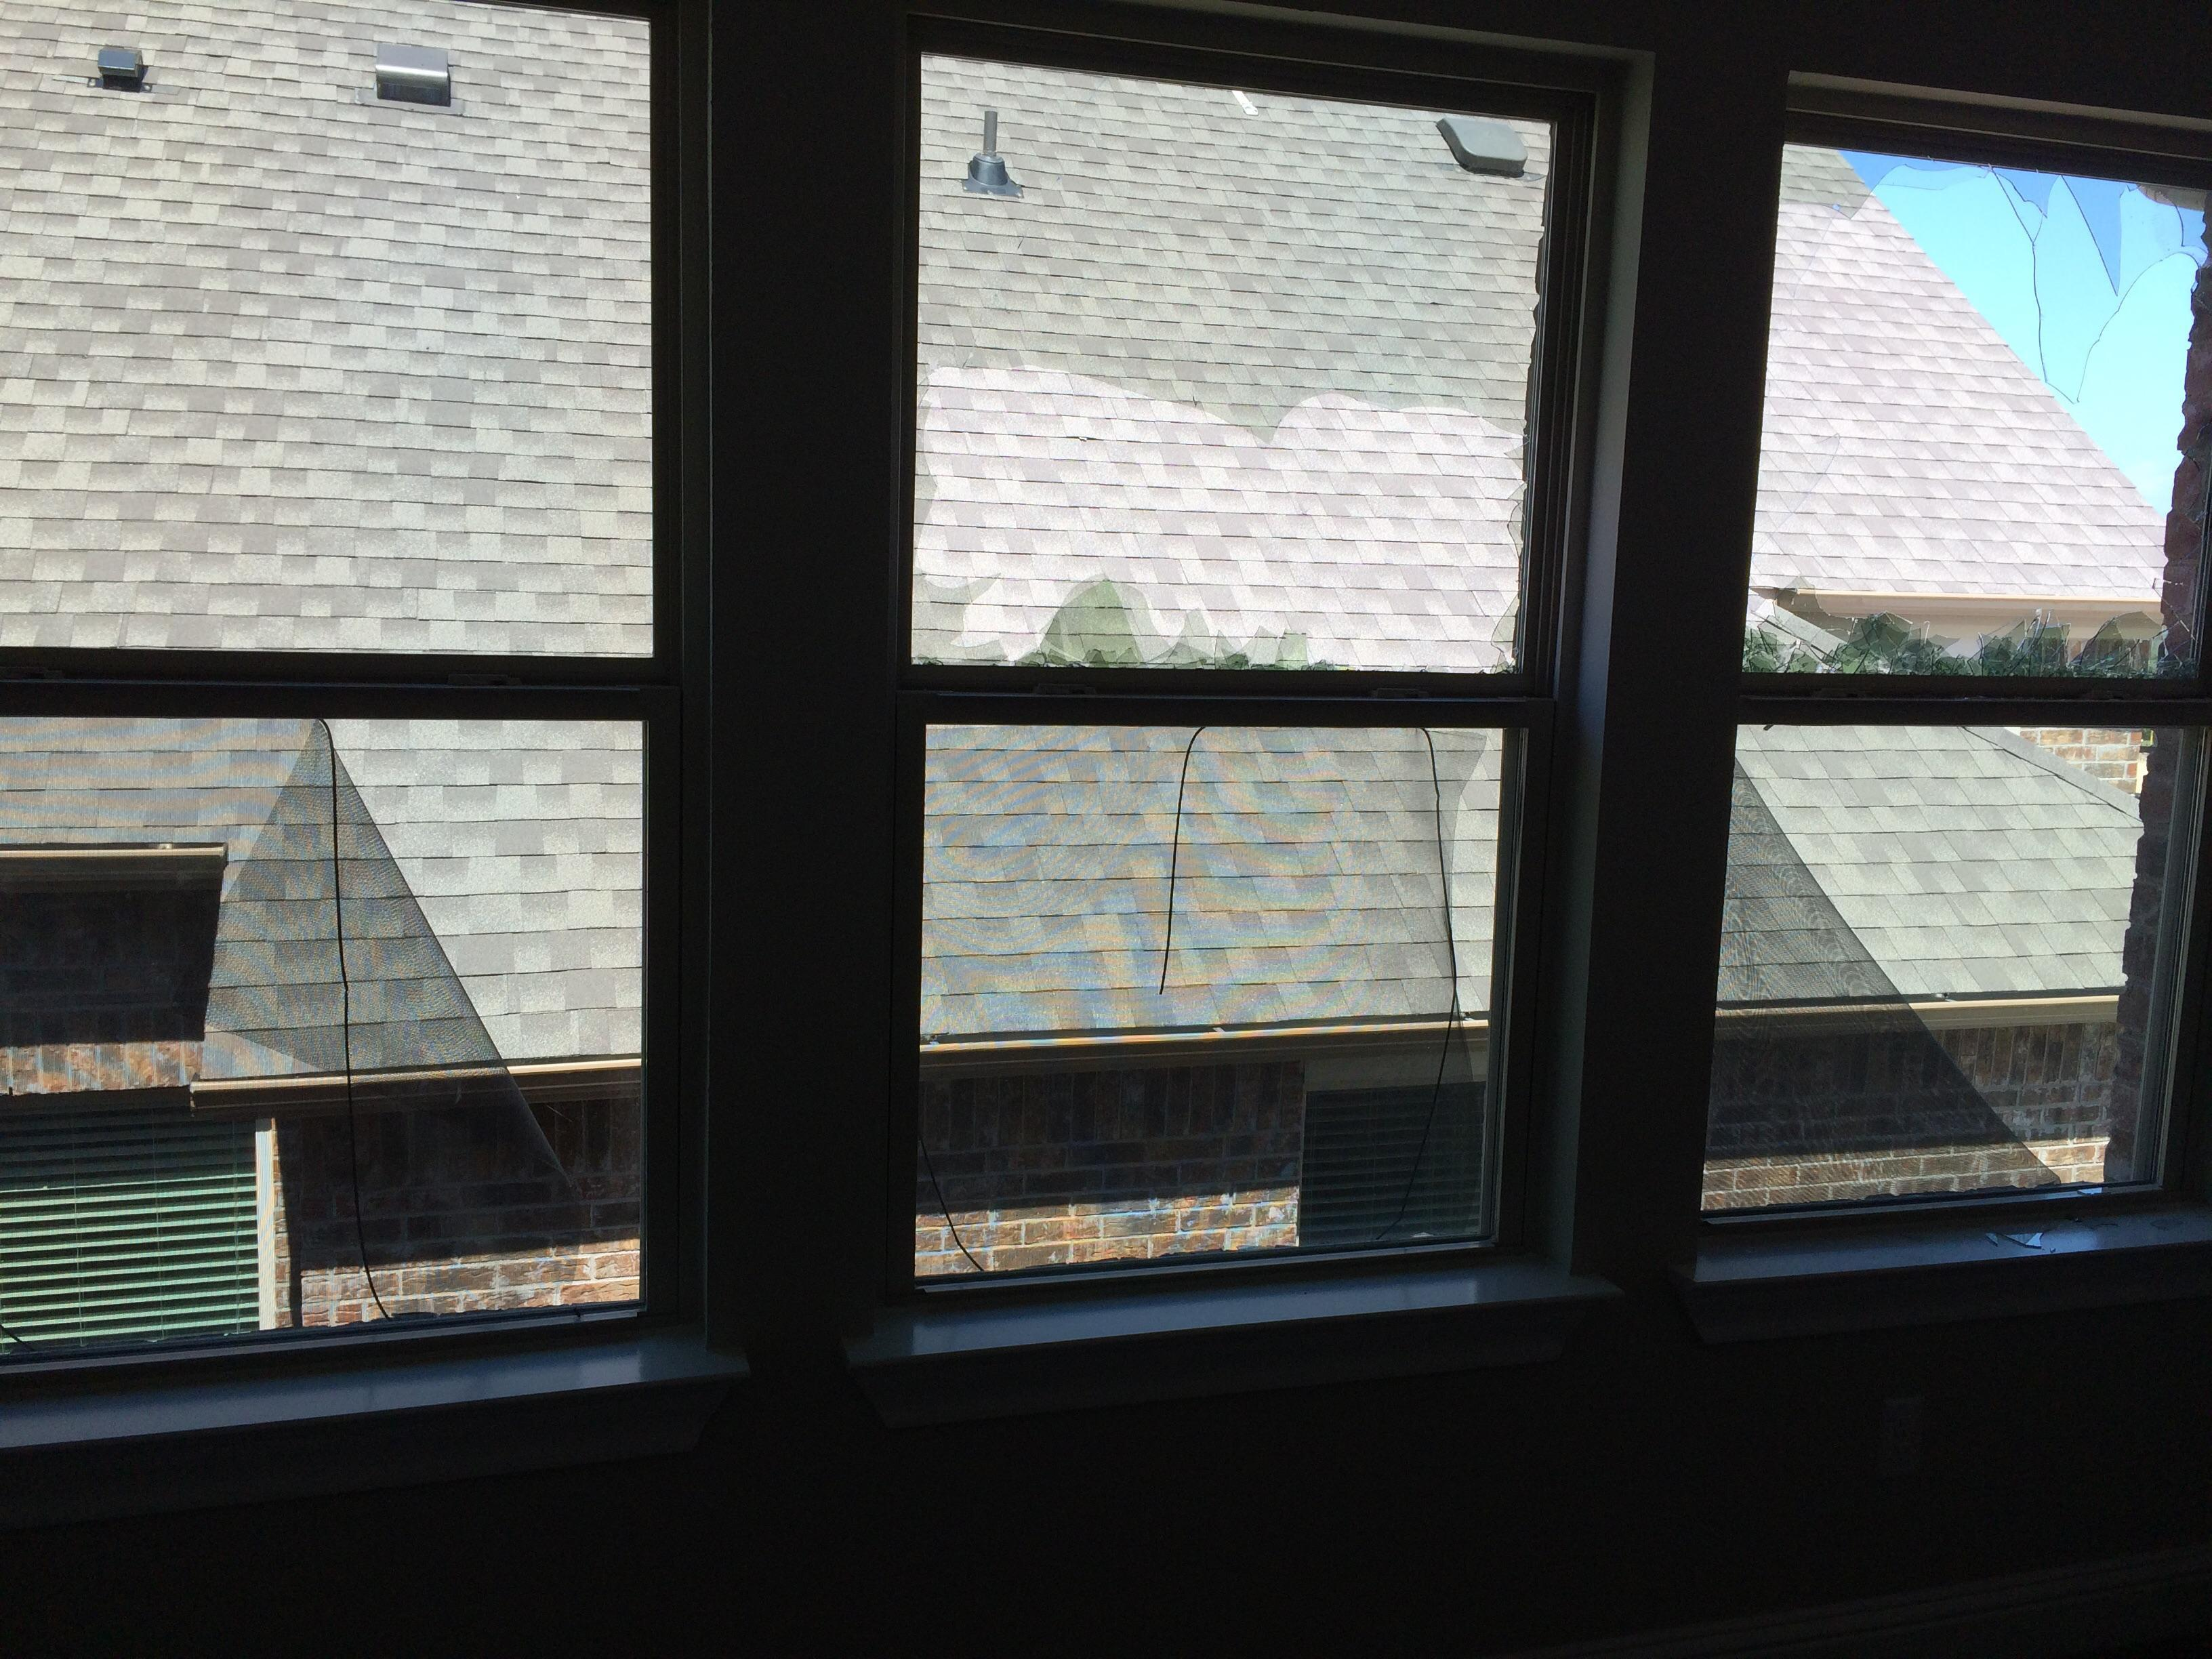 West Austin Roofing